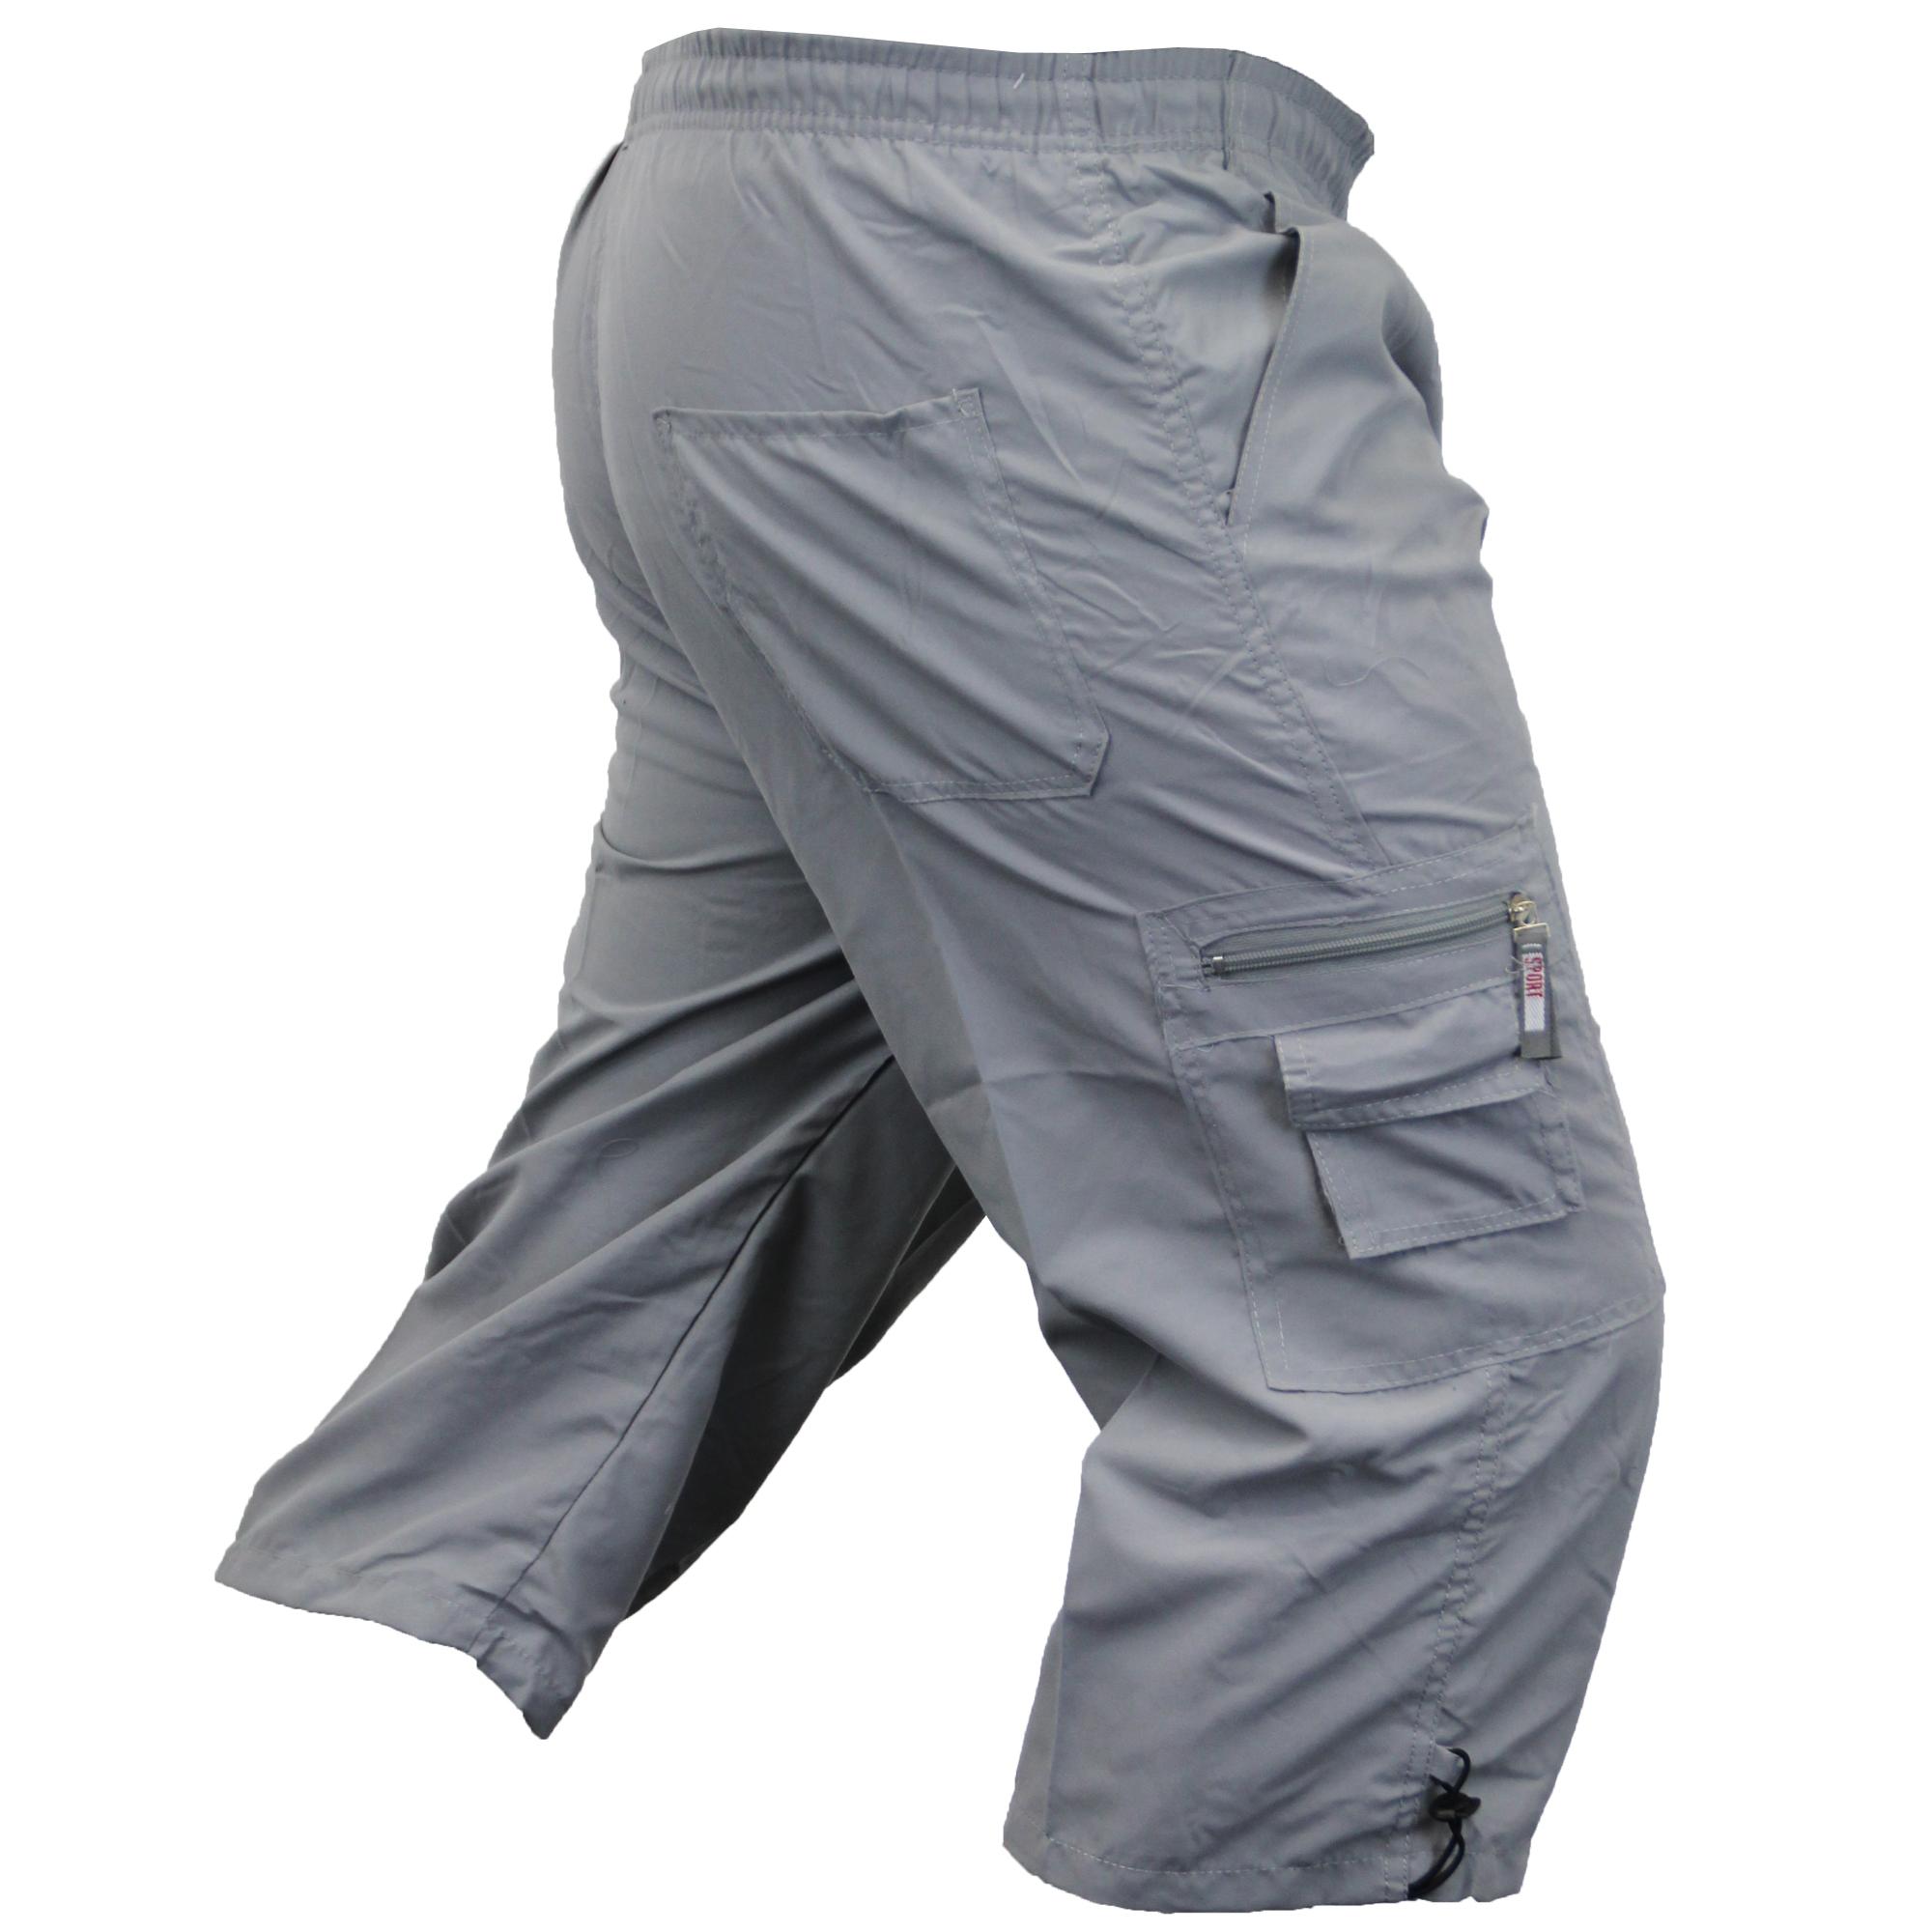 Mens-Combat-Cargo-Shorts-3-4-Length-Plain-Sport-Fashion-Casual-Summer-New thumbnail 7